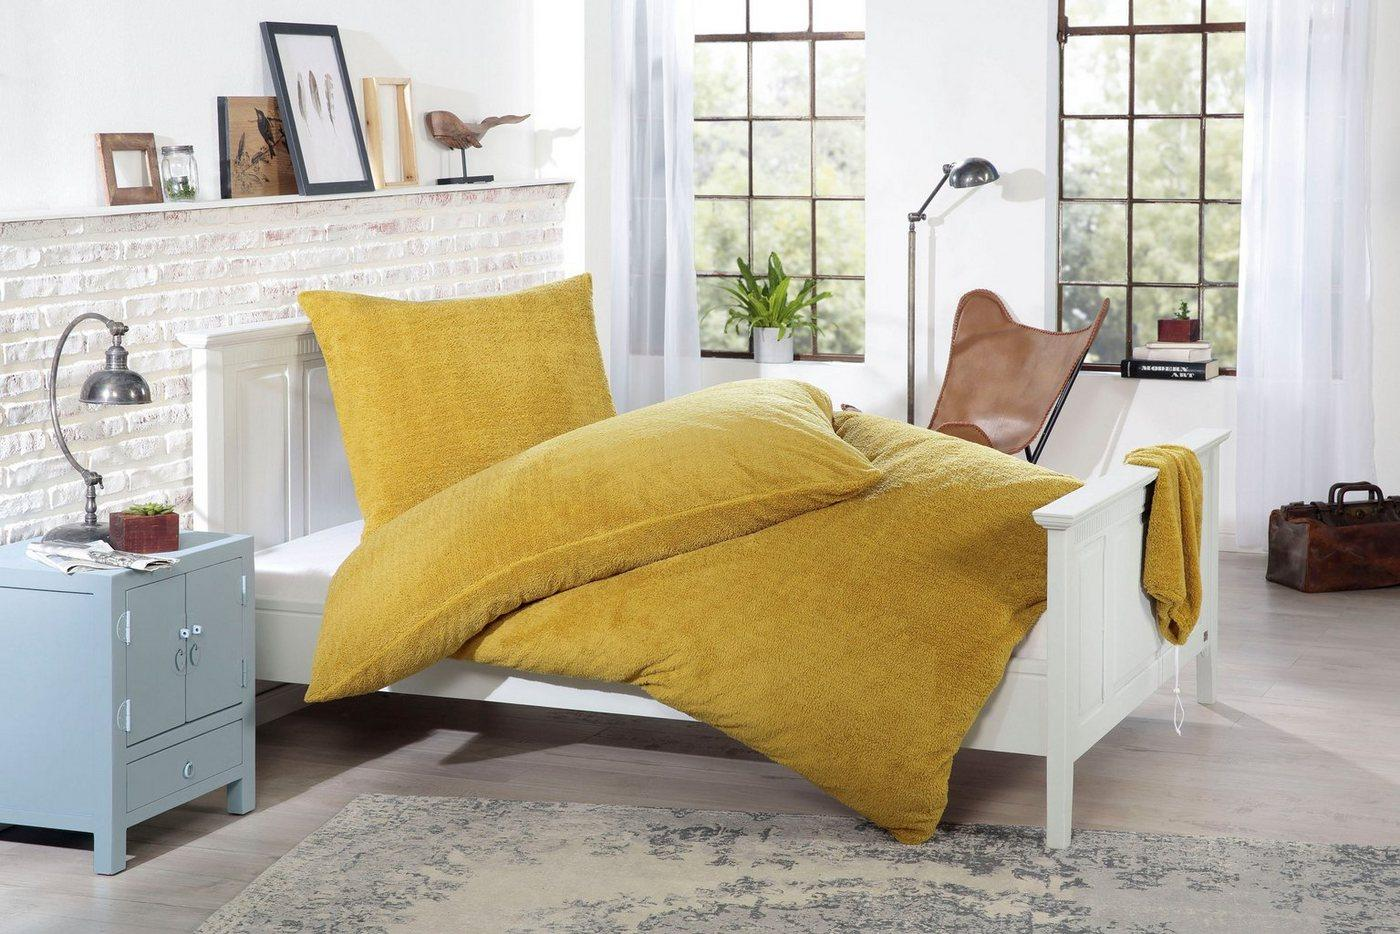 Bettwäsche »Knut«, Gözze, aus Lammfellimitat, gelb